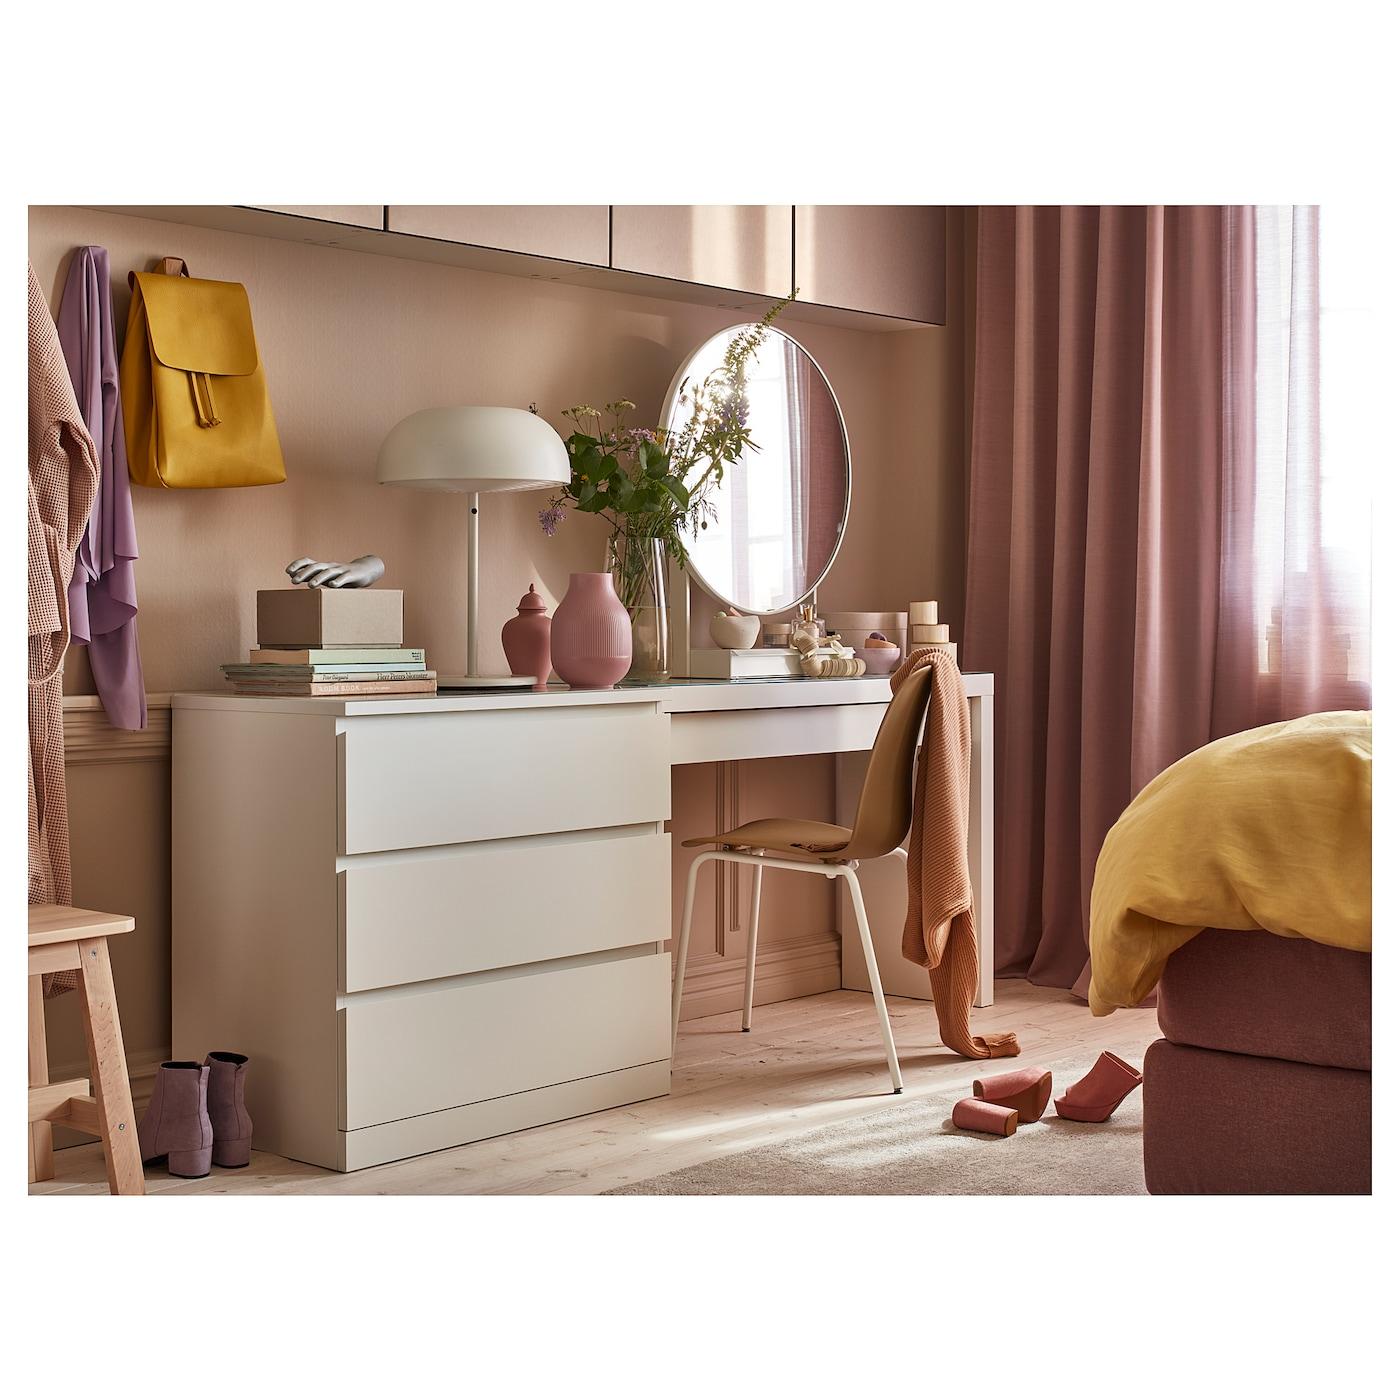 MALM Toalettbord, vit, 120x41 cm IKEA